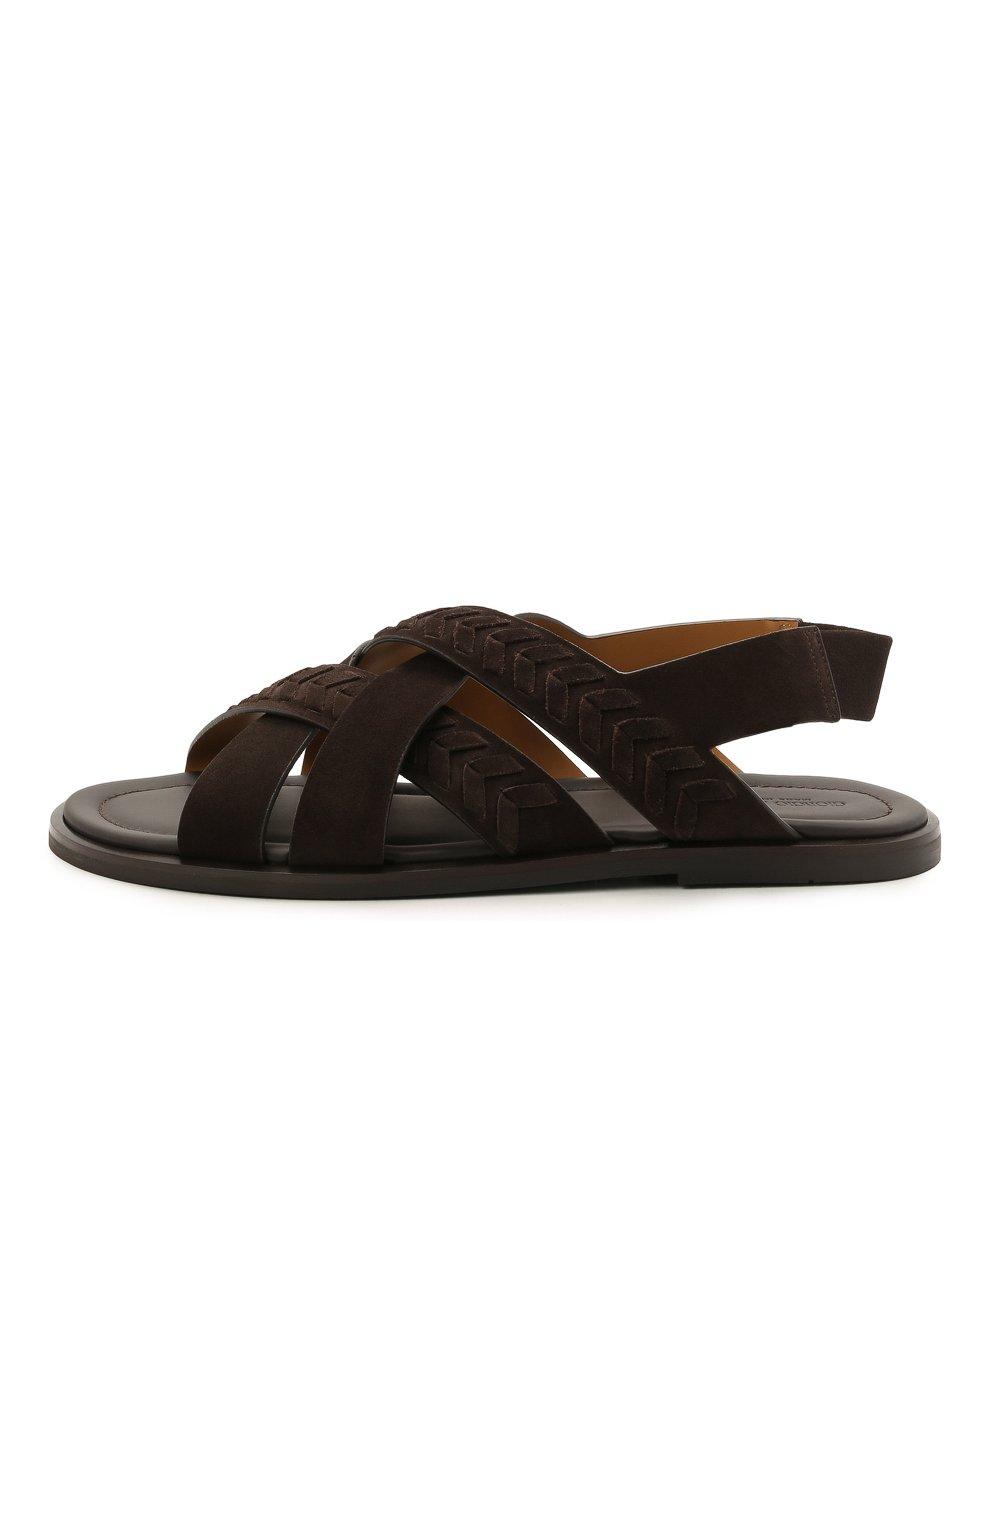 Мужские замшевые сандалии GIORGIO ARMANI коричневого цвета, арт. X2P073/XM818 | Фото 3